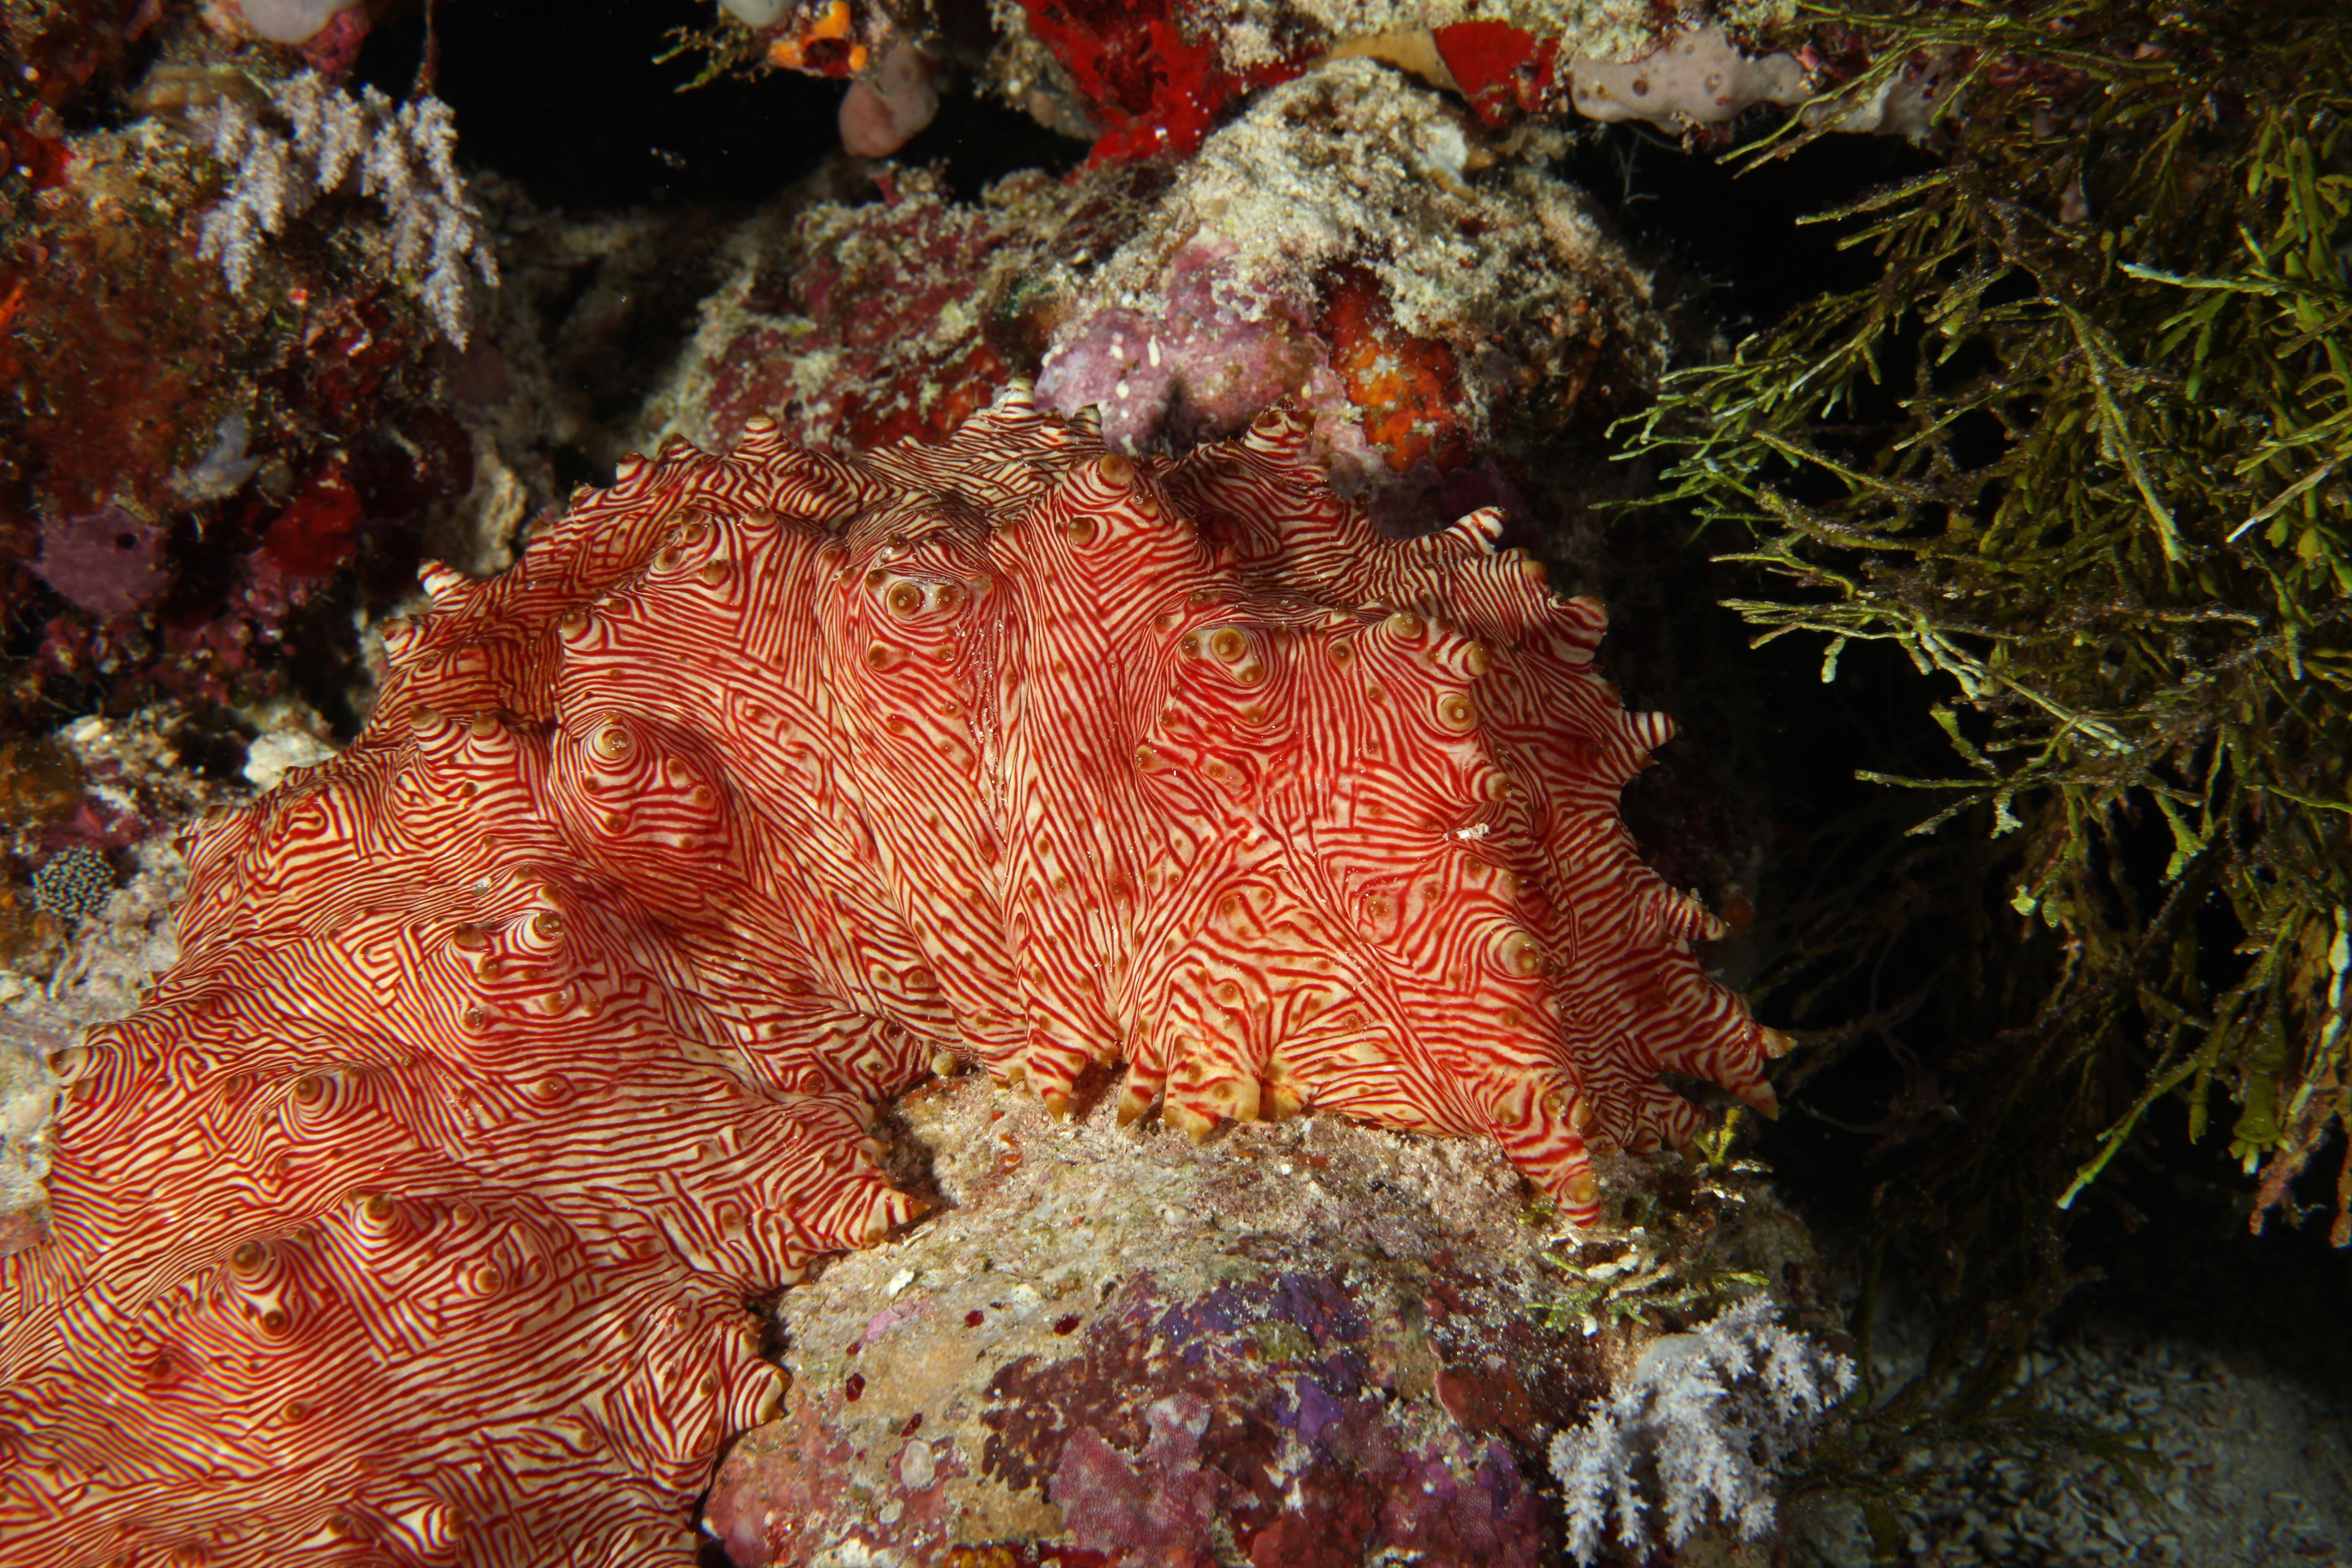 File:Treasure chest candycane sea cucumber 2.jpg - Wikimedia Commons